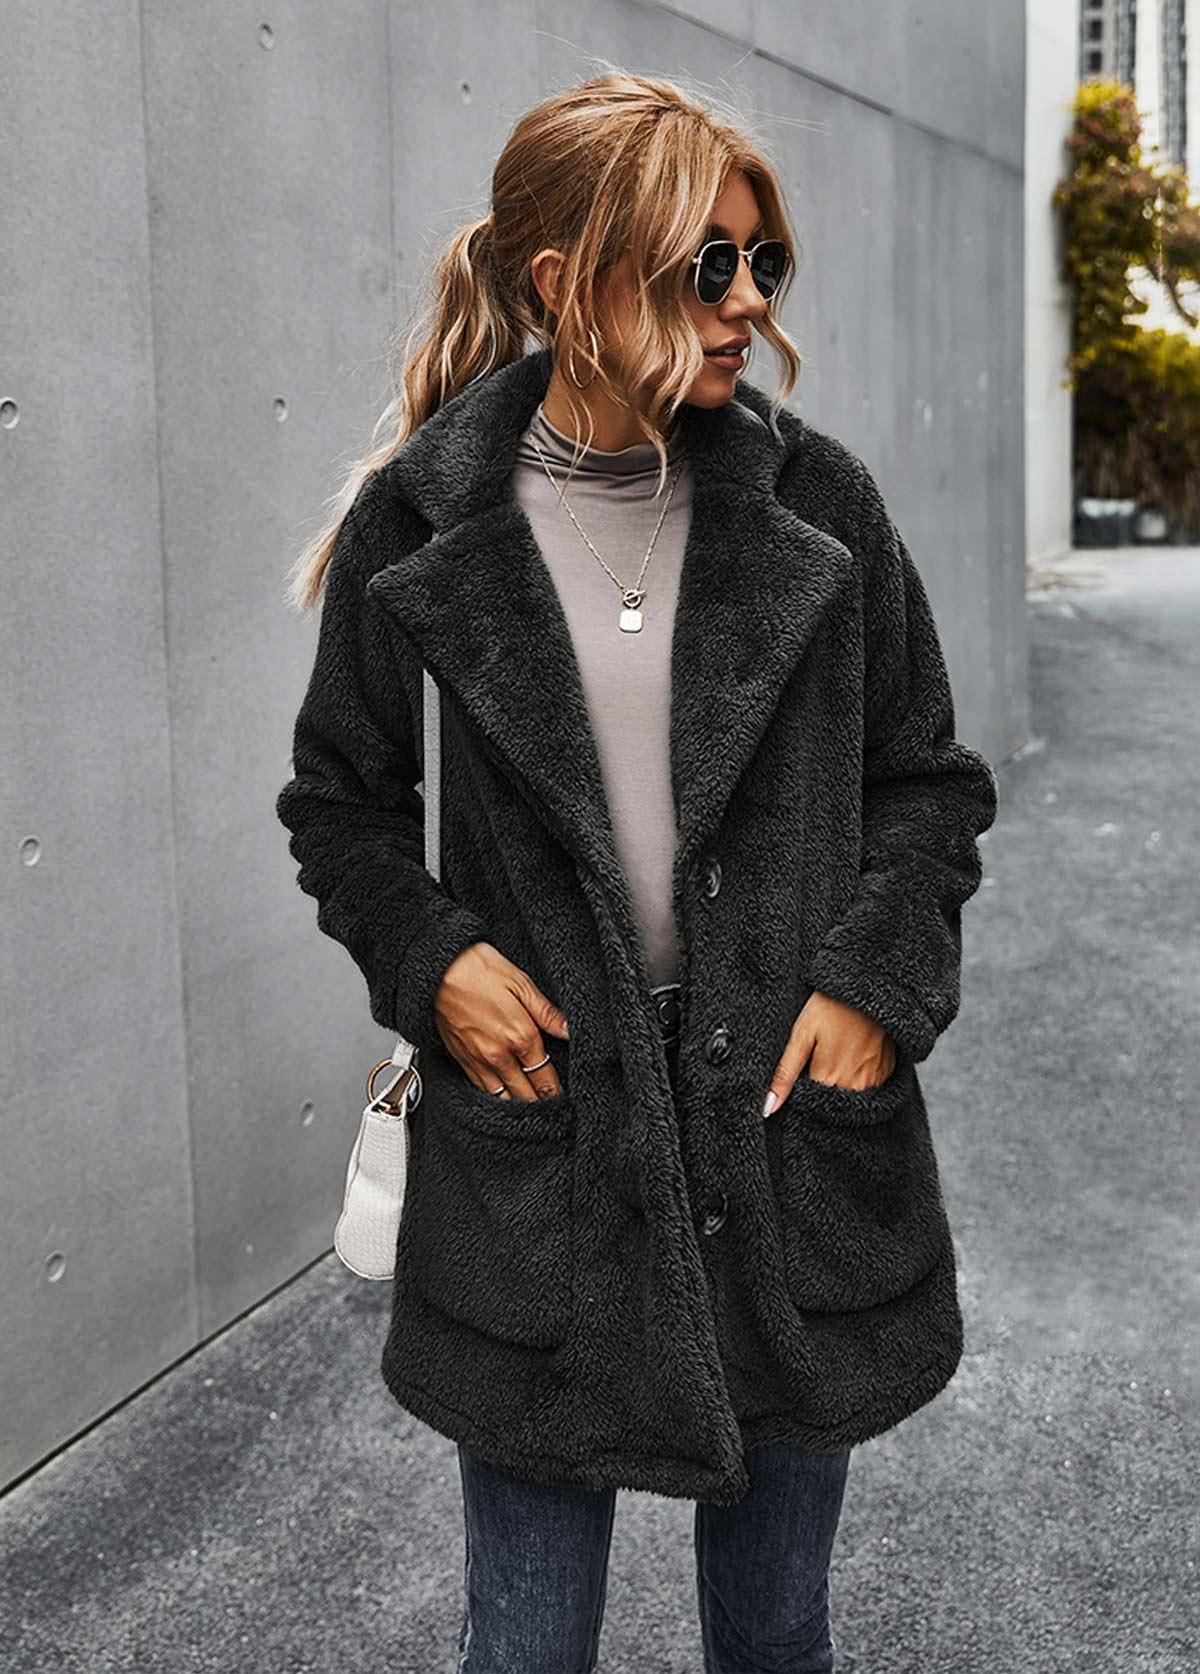 Pocket Turndown Collar Button Up Fluffy Coat